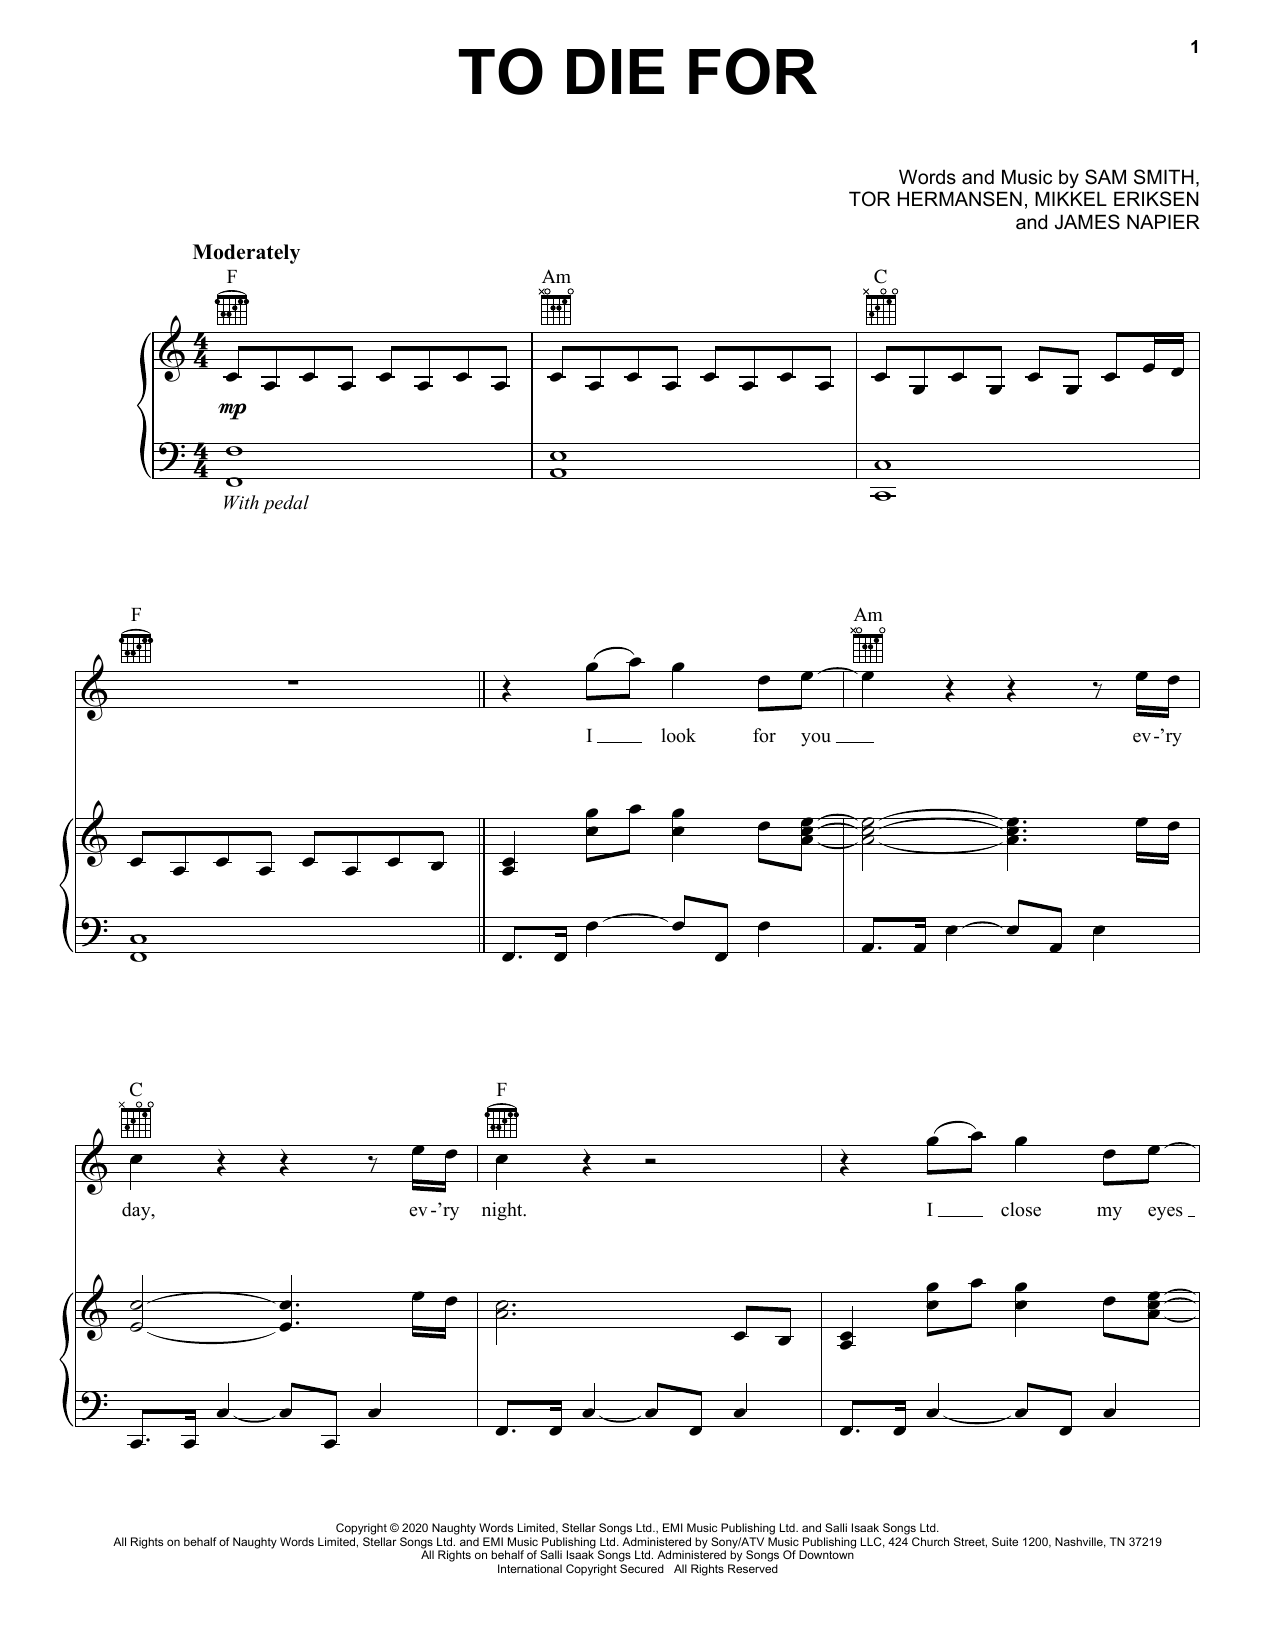 Sam Smith To Die For Sheet Music Notes Chords Score Download Printable Pdf Sheet Music Sheet Music Notes Pop Sheet Music